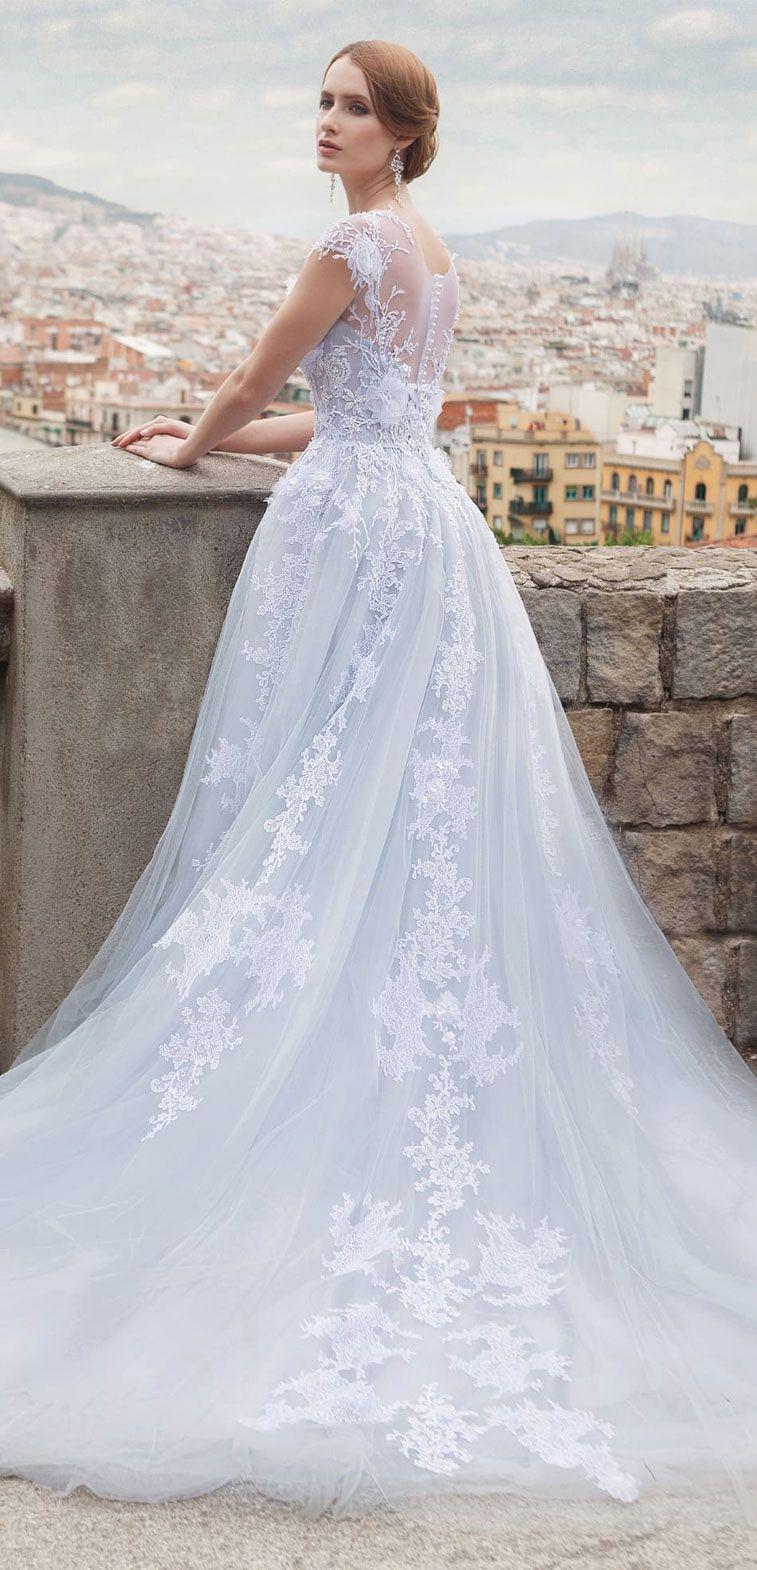 Gabbiano Wedding Dresses – Princess Dreams Collection